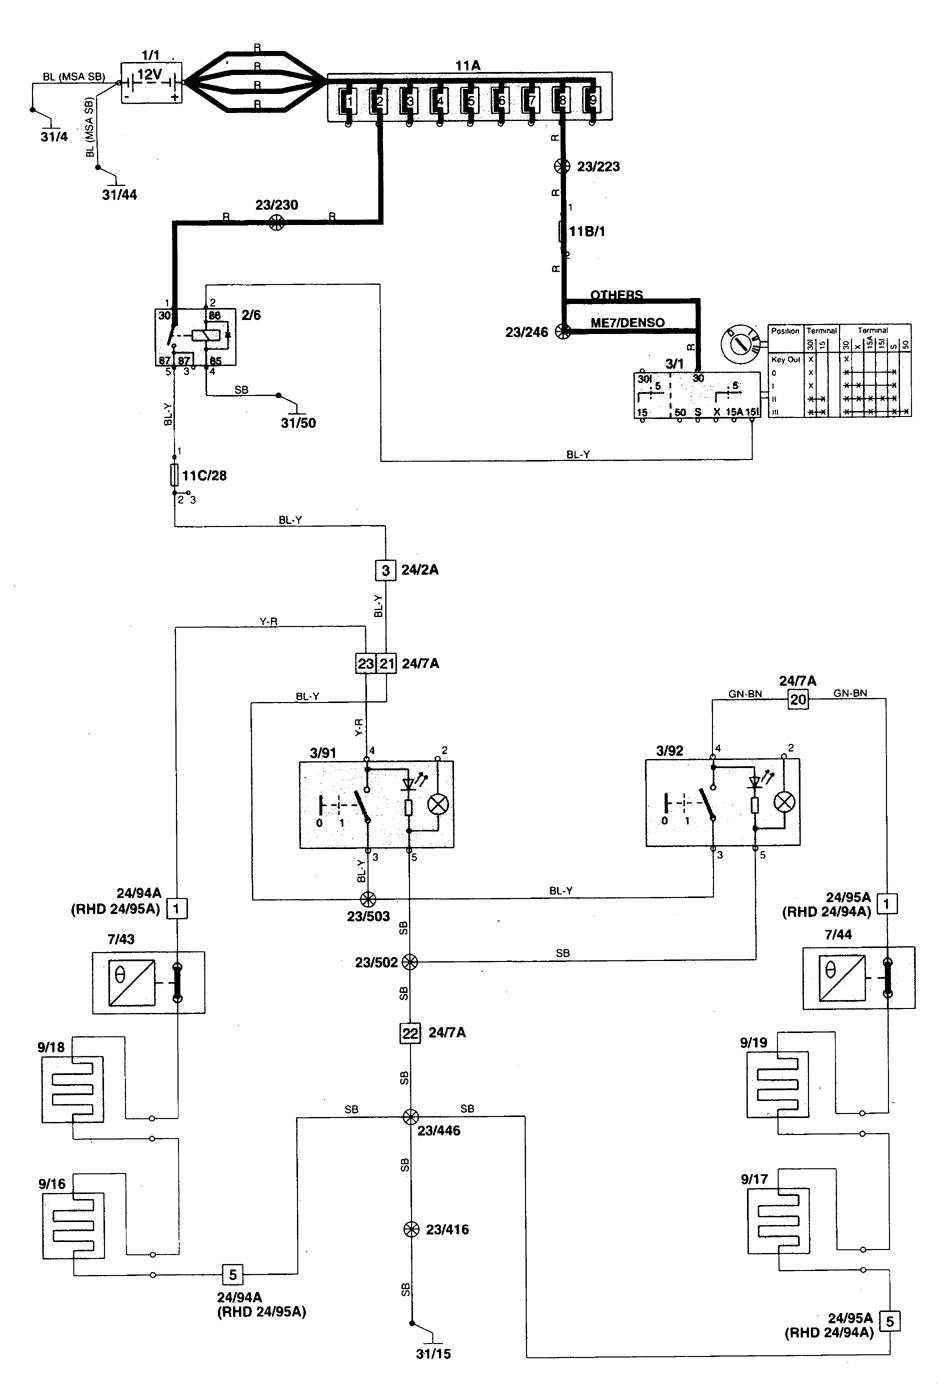 yl_5372] volvo s60 wiring diagram pdf headlight wiring diagram 2001 volvo s60 2001 volvo v70 relay diagram lotap neph opogo emba mohammedshrine librar wiring 101